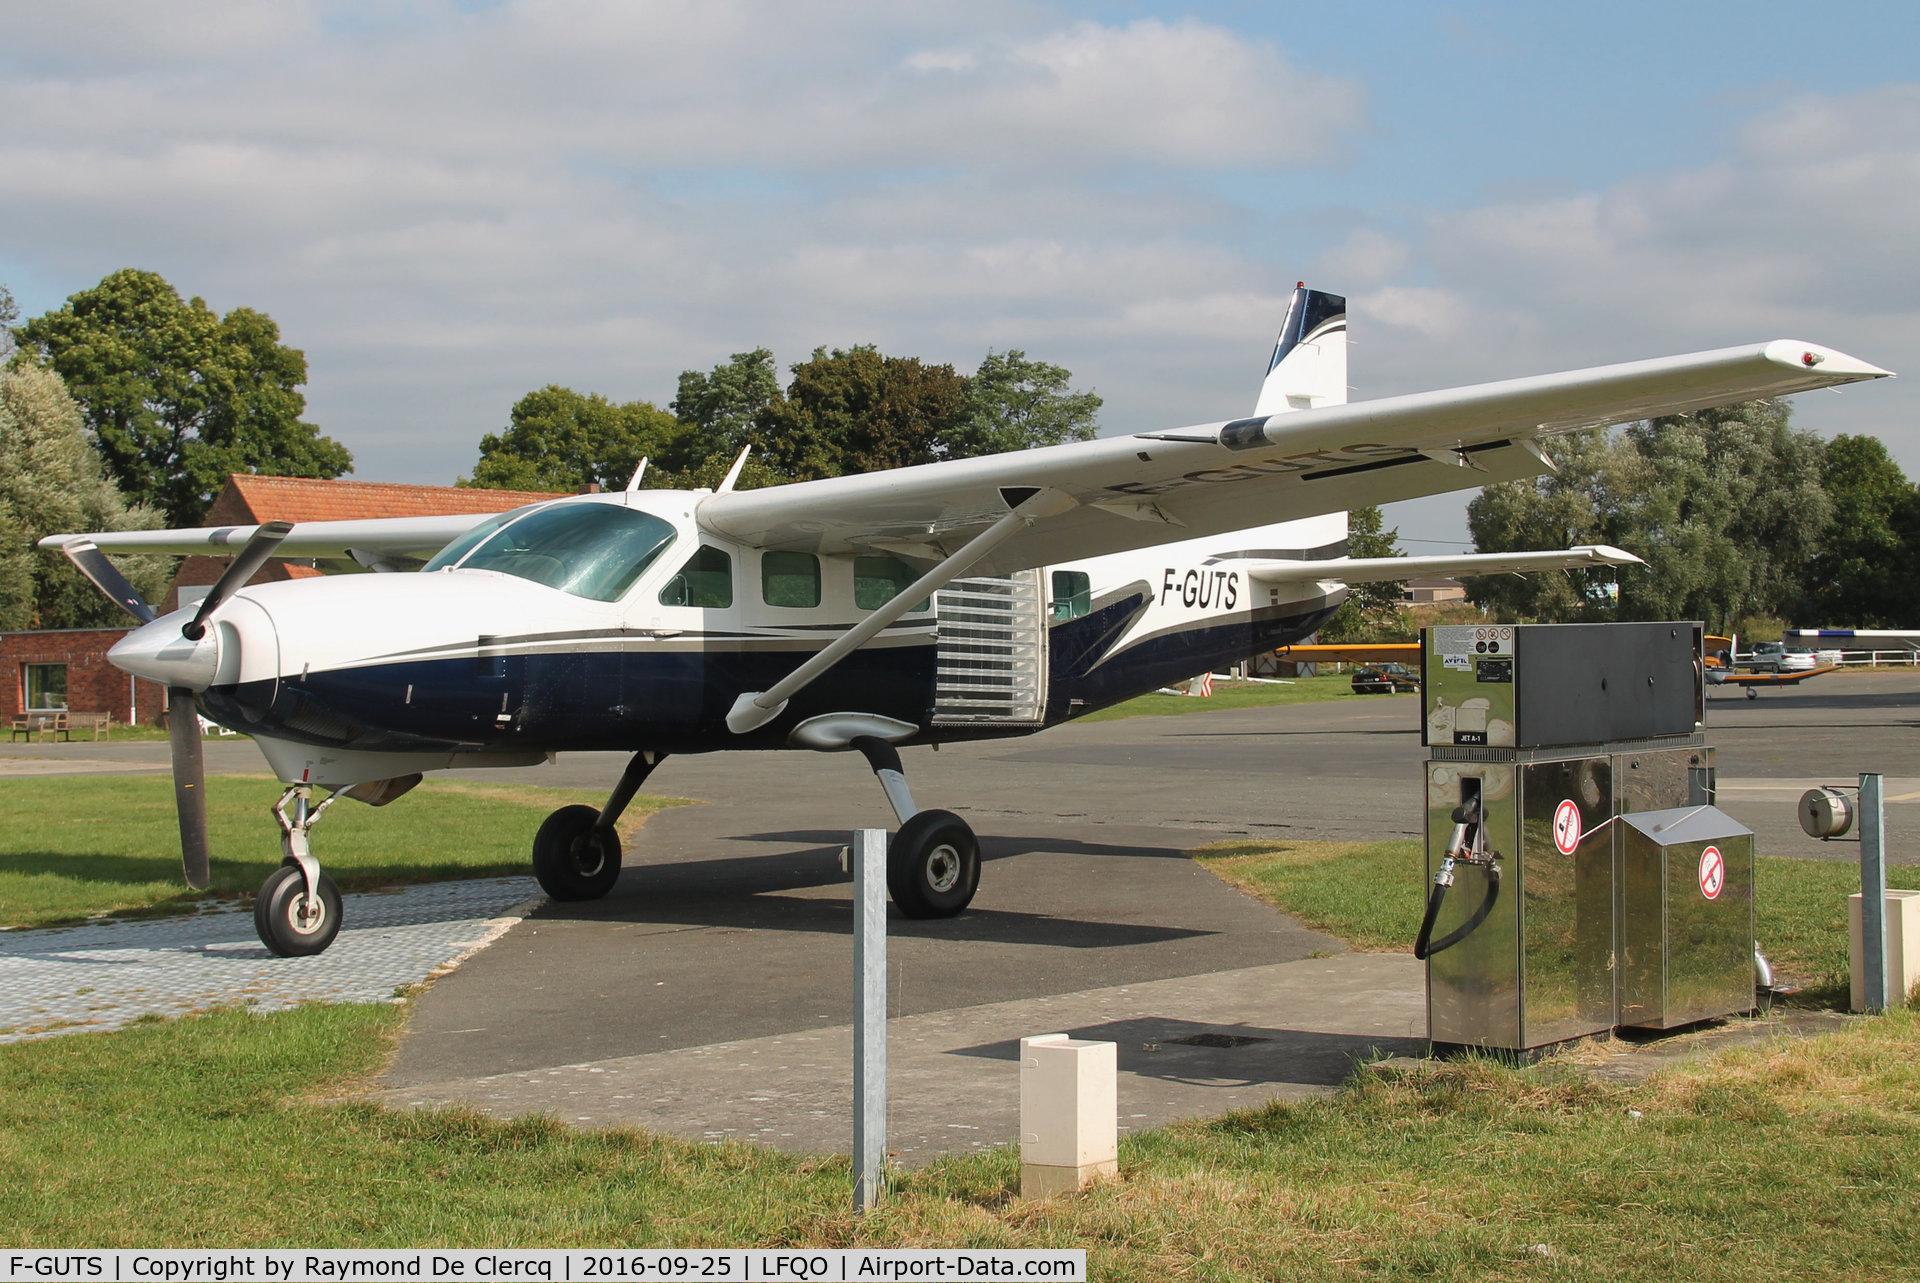 F-GUTS, 1993 Cessna 208 Caravan 1 C/N 20800225, Skydiving at Lille-Marcq.